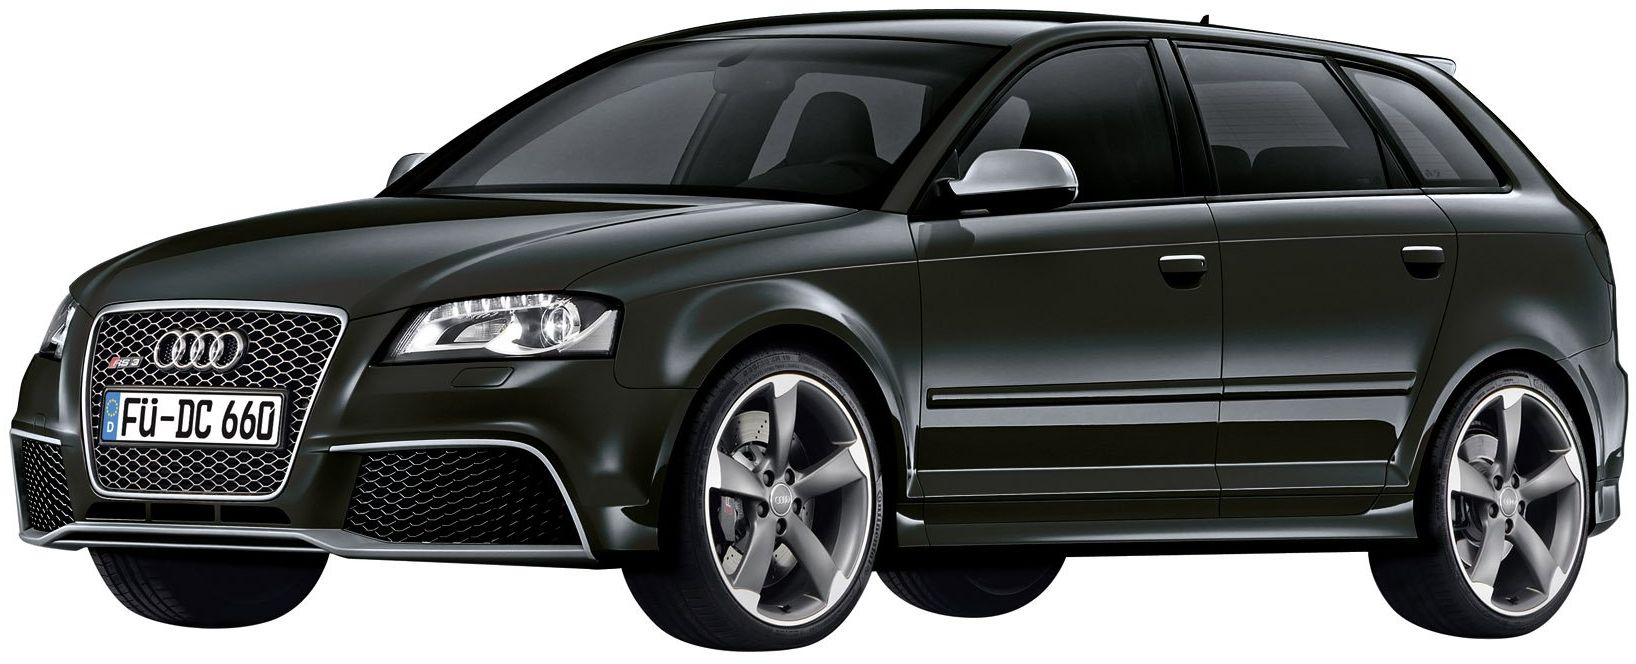 Dickie-Schuco 450880100 - Schuco - Audi RS 3, czarny fantomowy 1:43 Sportback